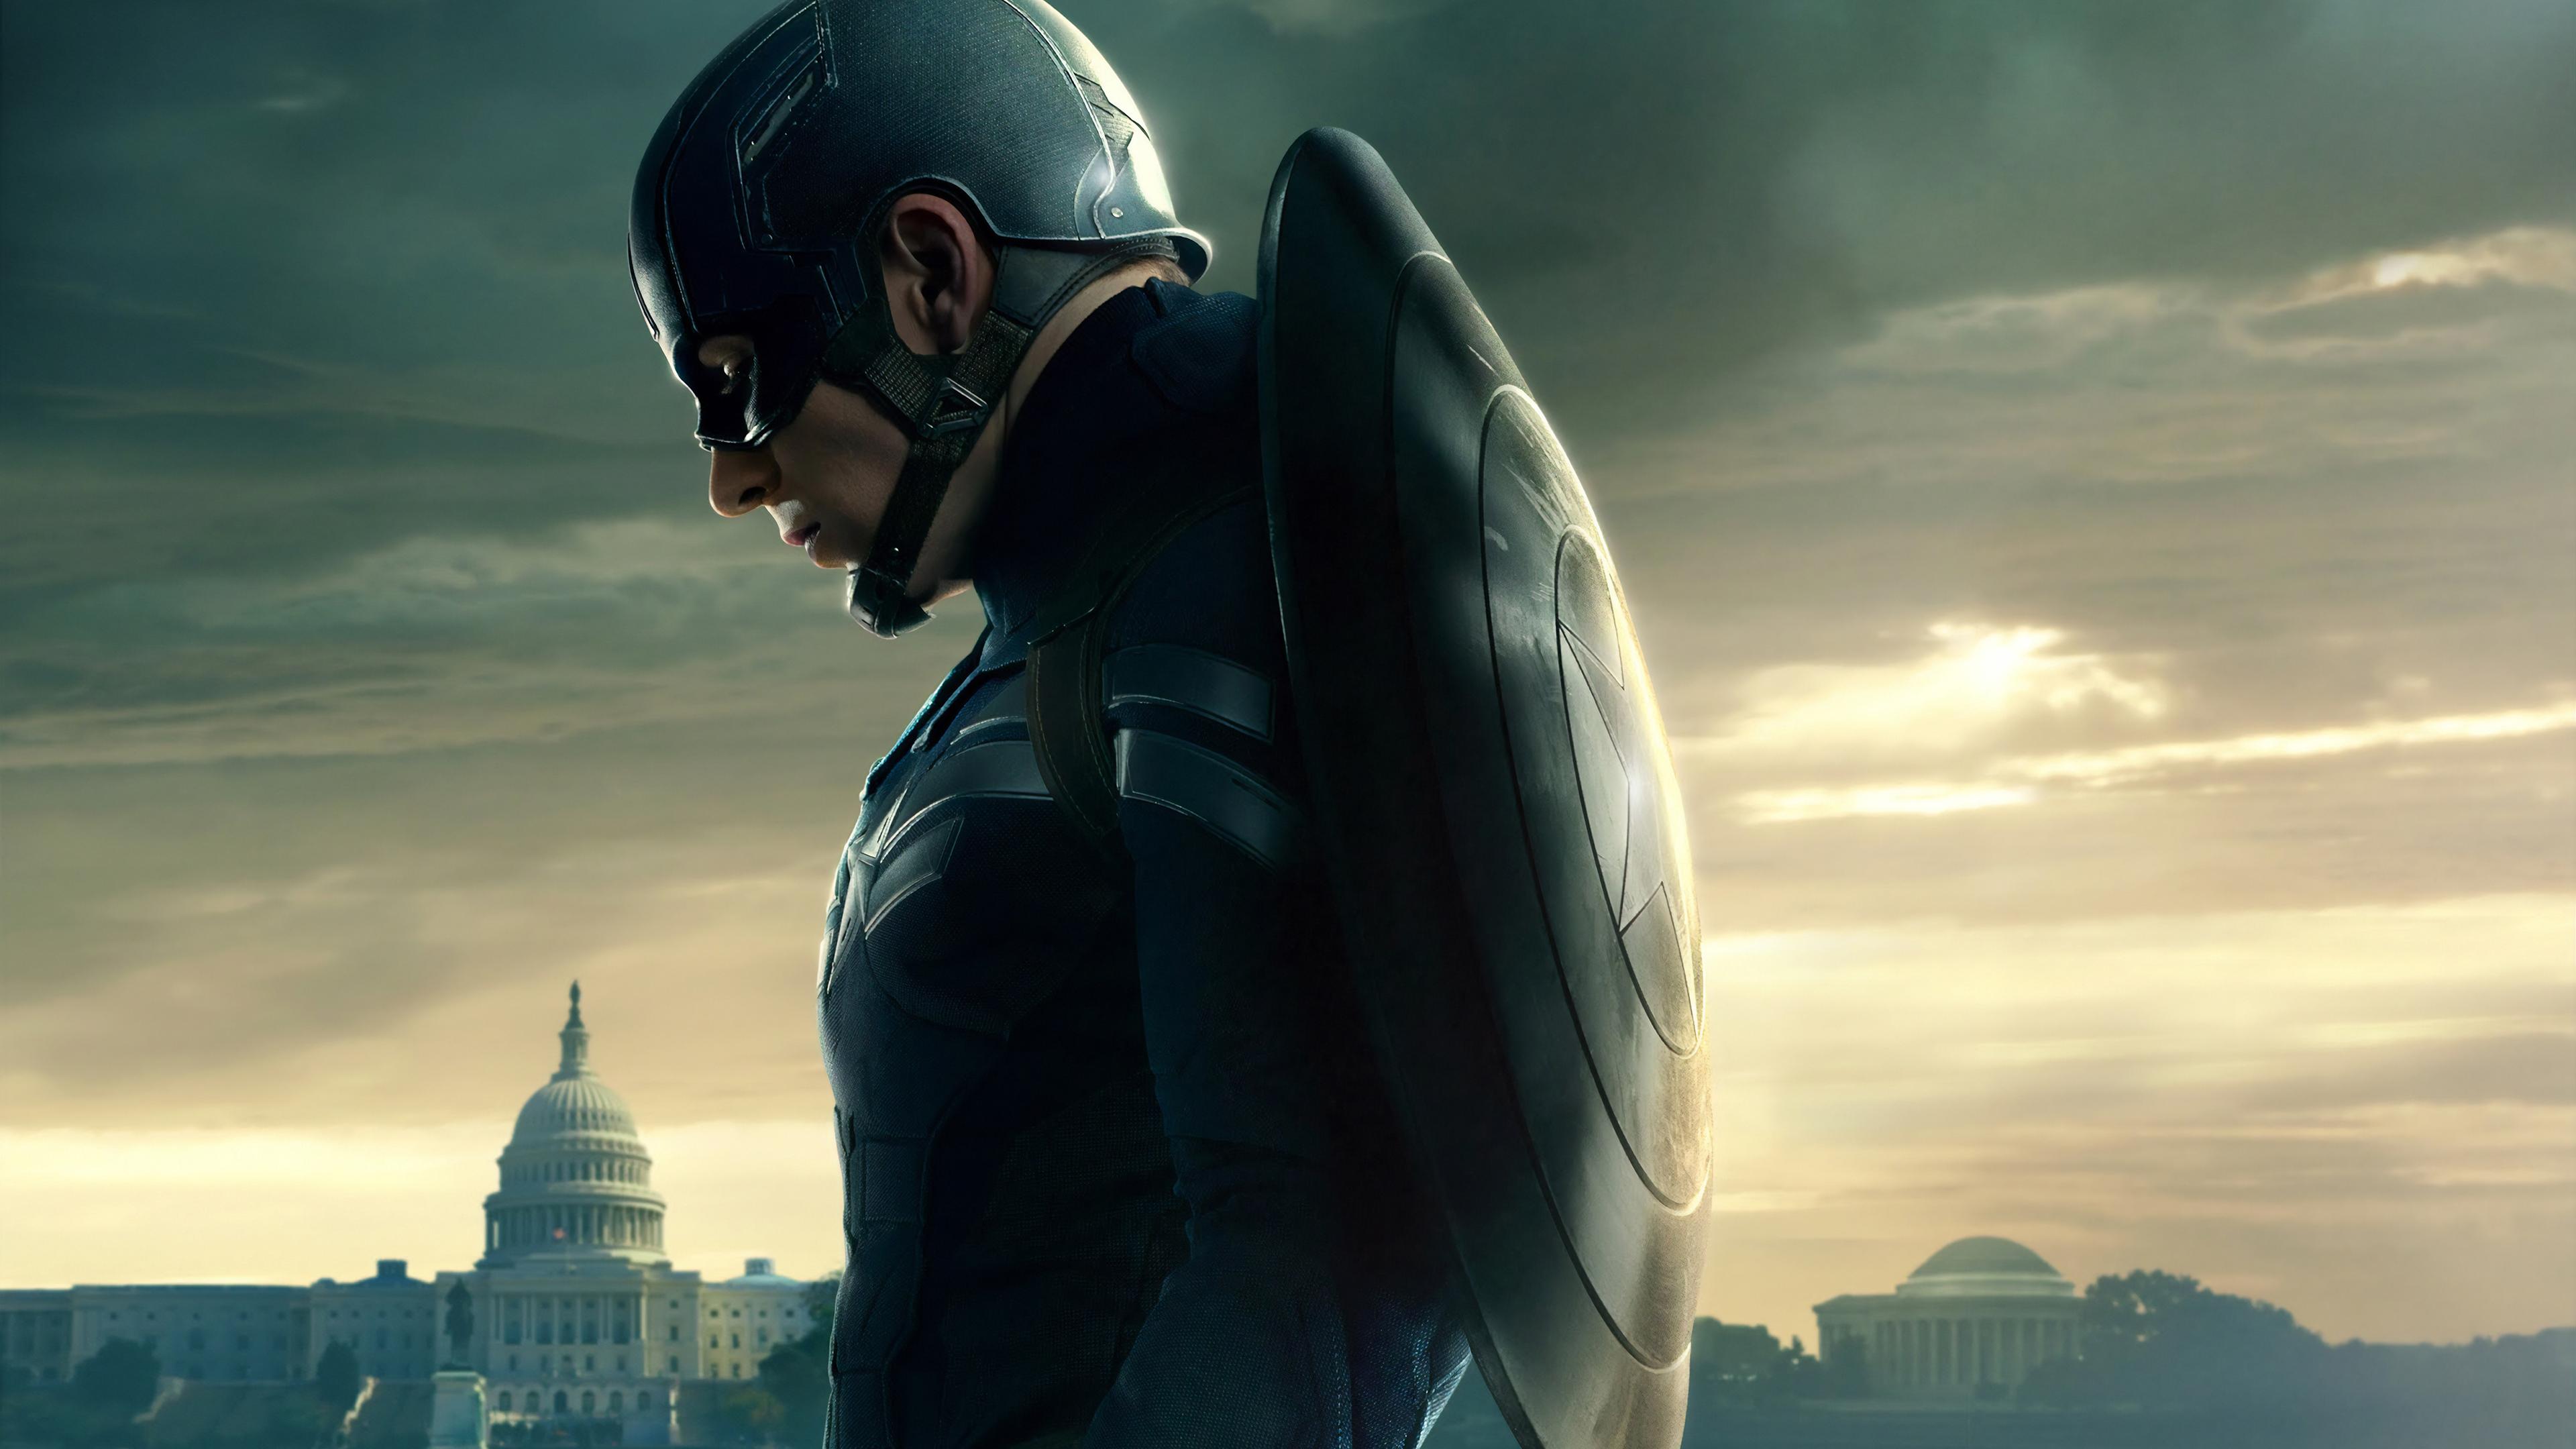 captain america 1562106242 - Captain America - superheroes wallpapers, hd-wallpapers, captain america wallpapers, 4k-wallpapers